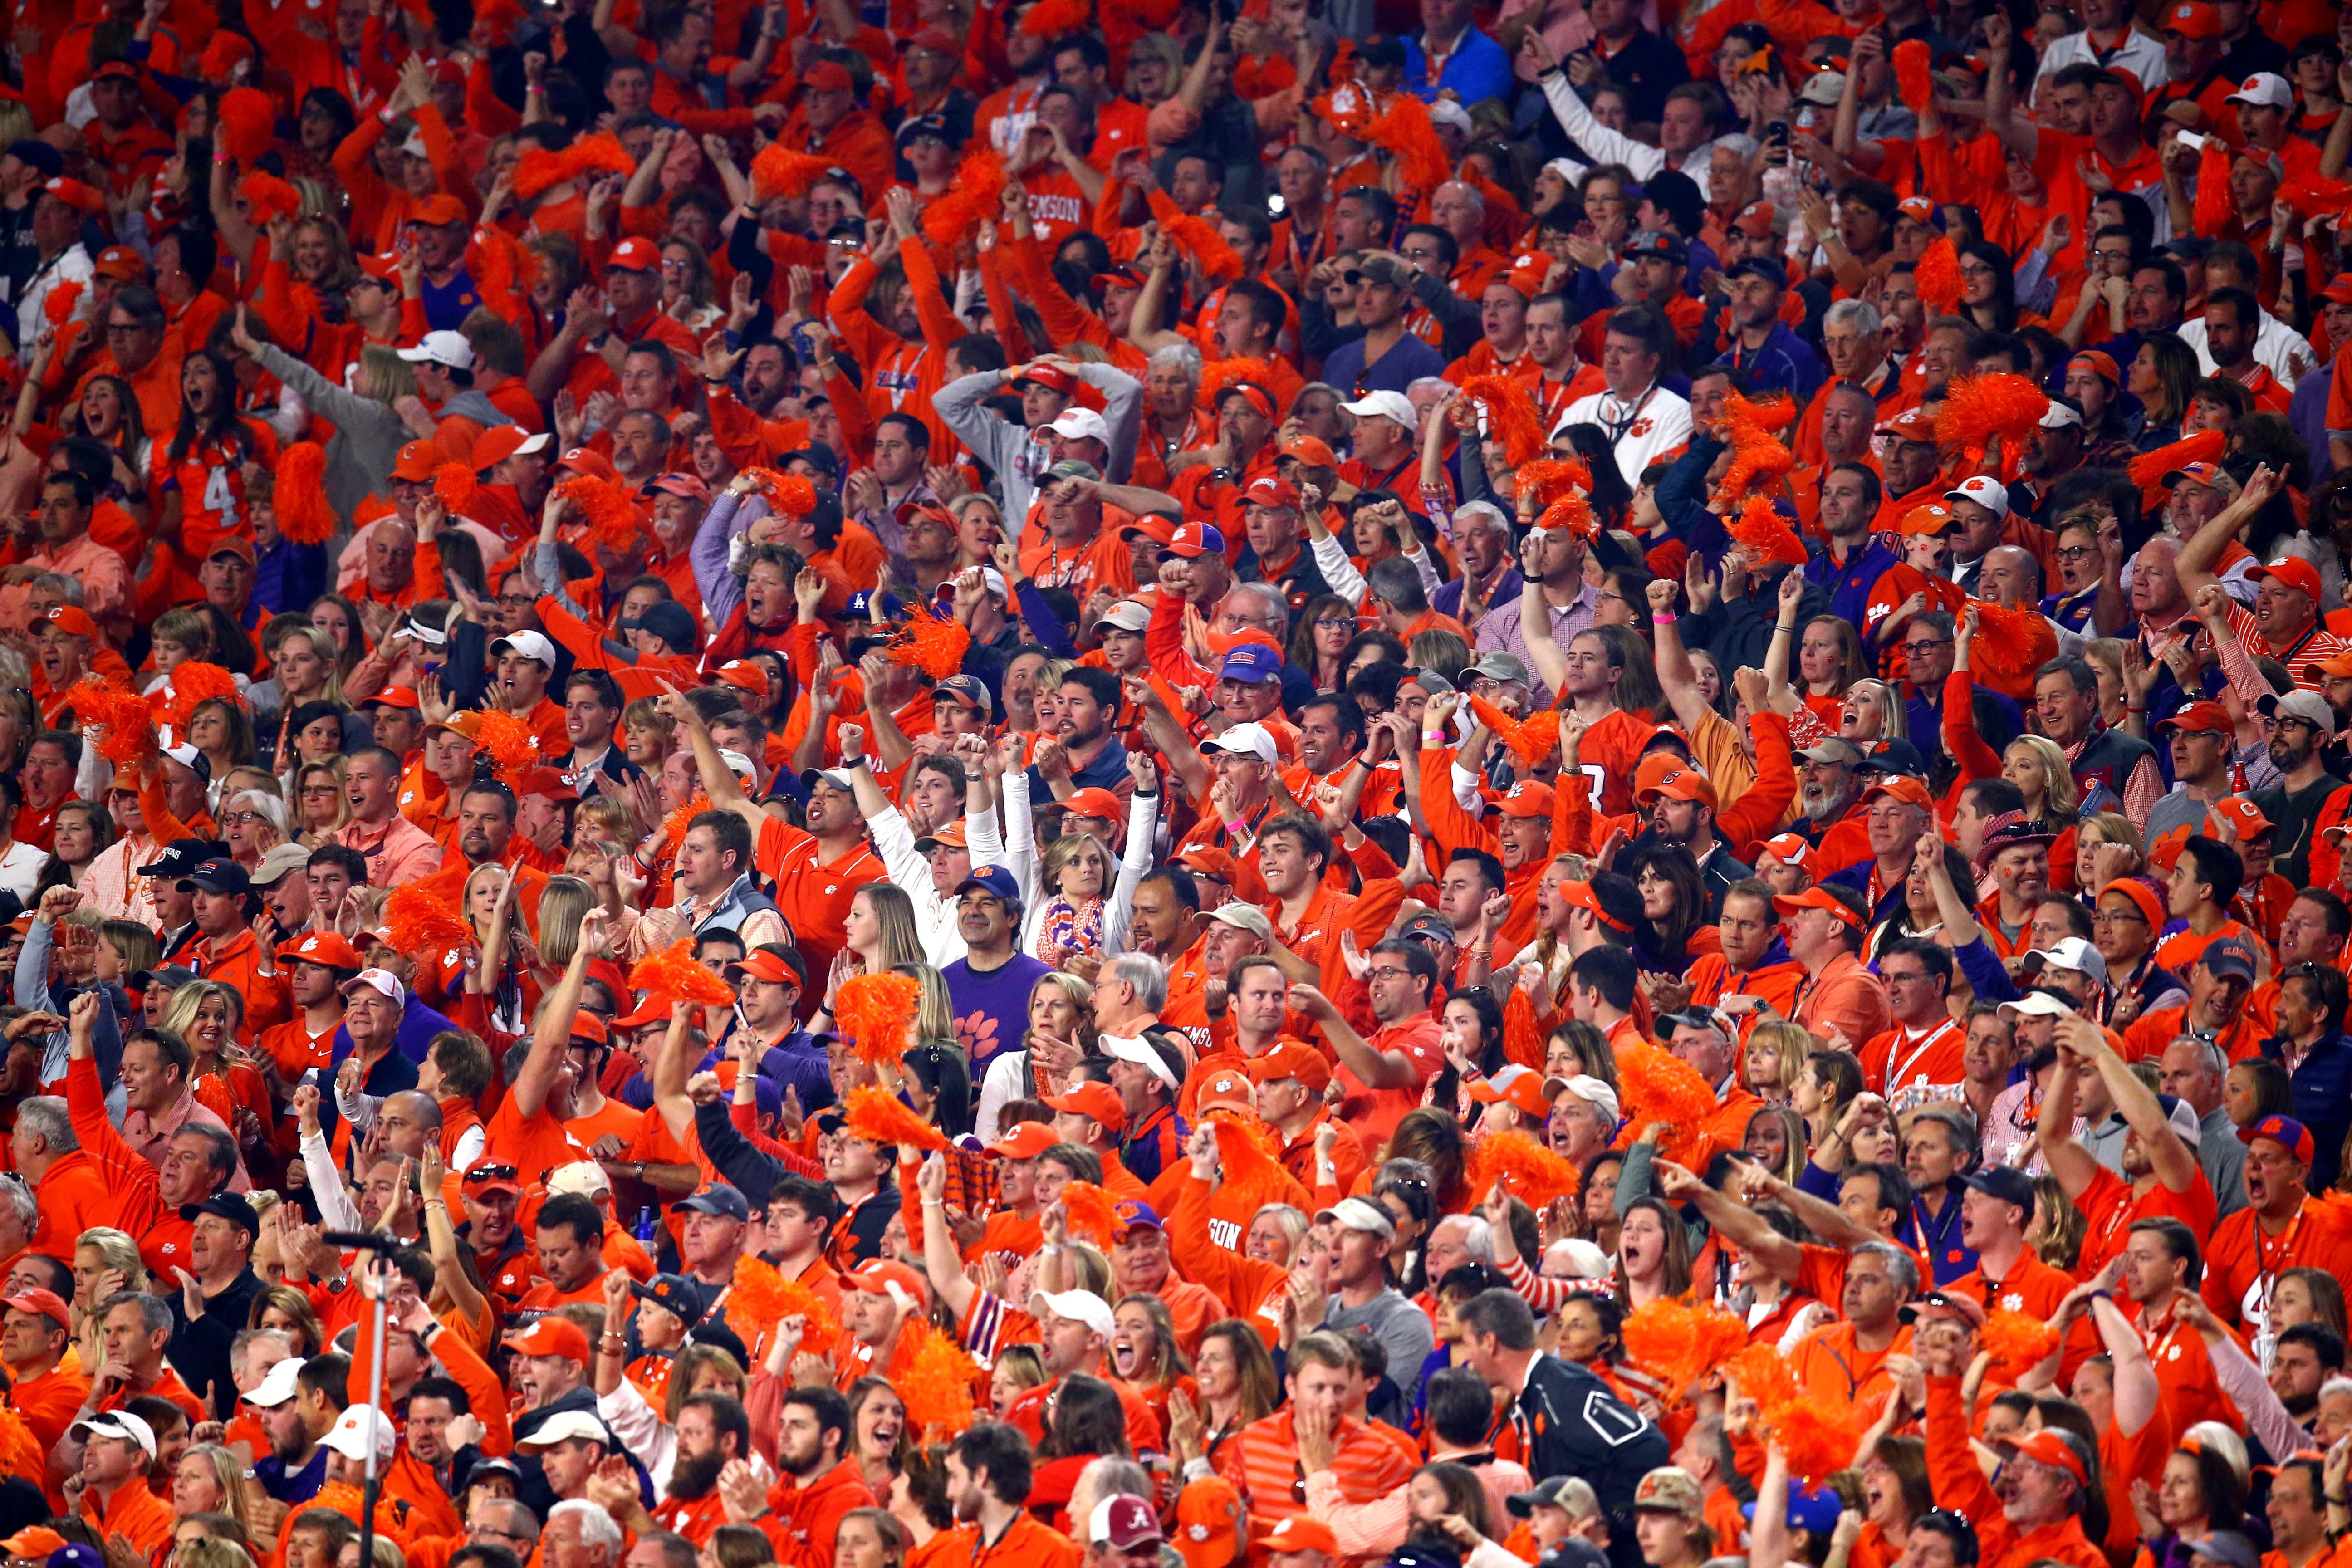 NCAA Football: CFP National Championship-Alabama vs Clemson